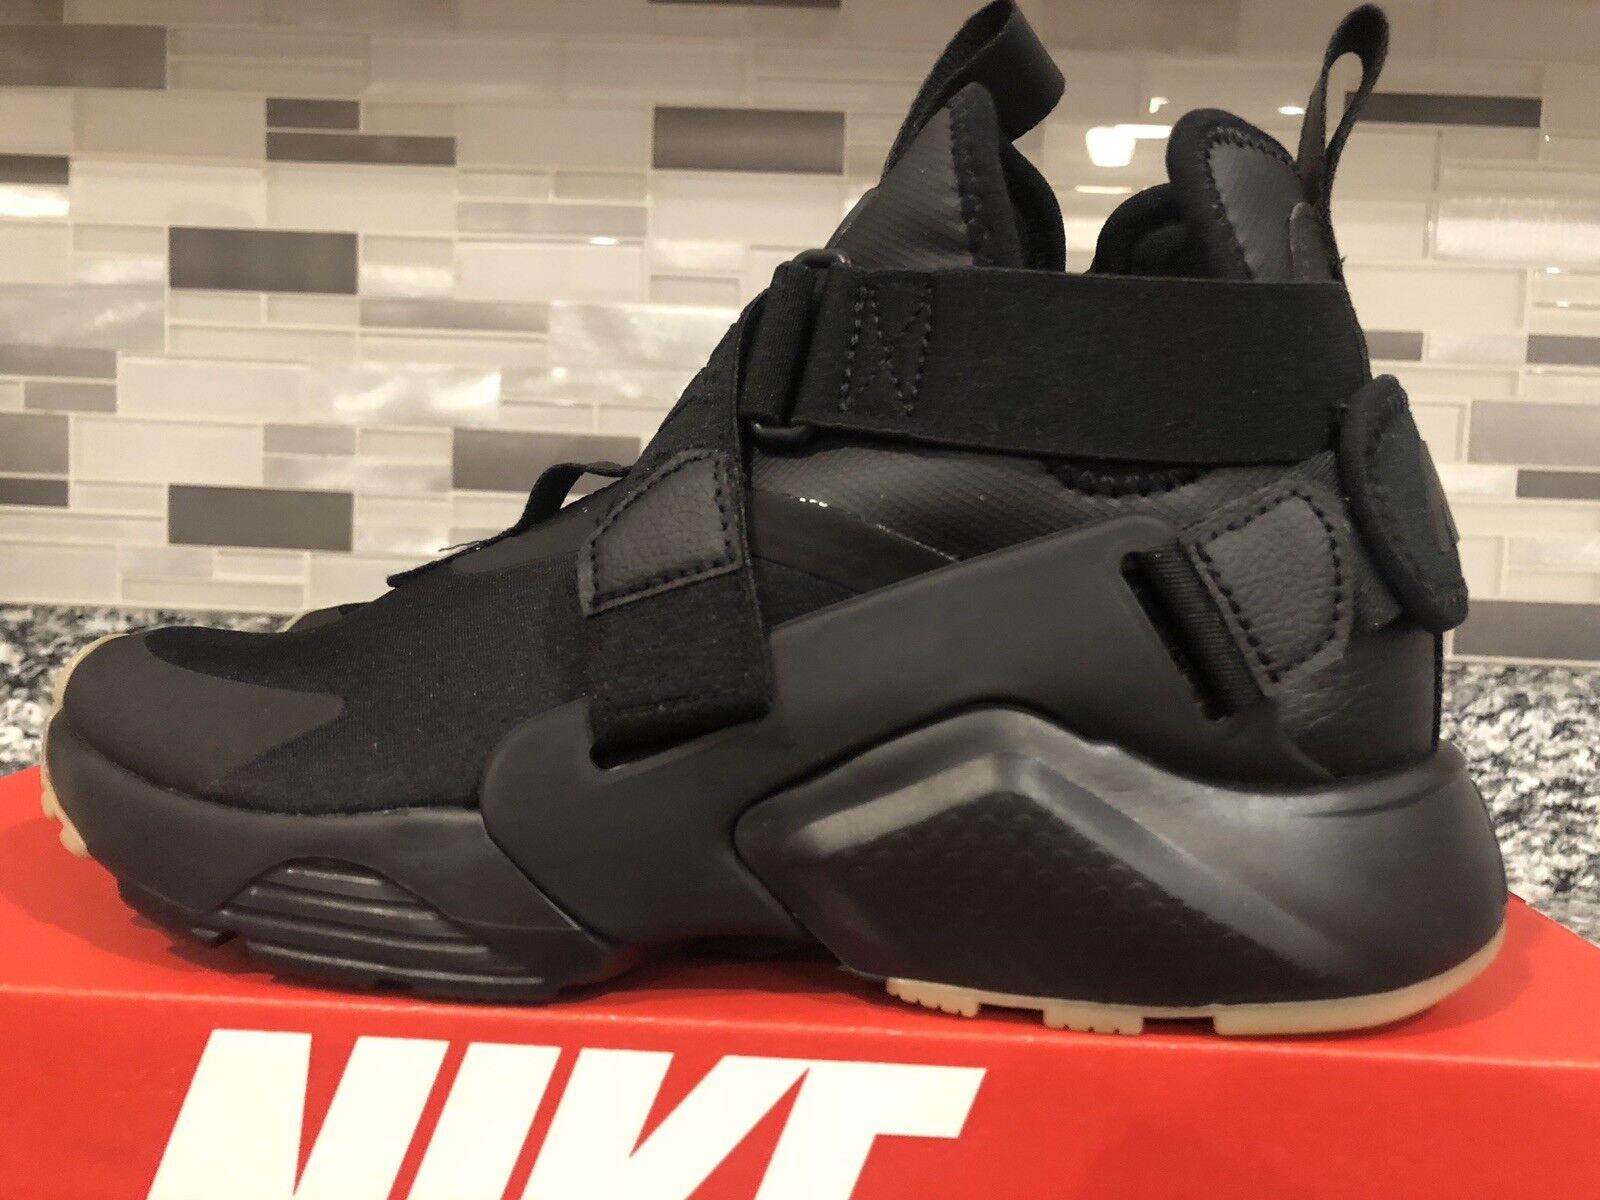 Nike Air Huarake City  nero  Dark grigio (AH6787 -003) Wouomo 6.5  benvenuto a scegliere